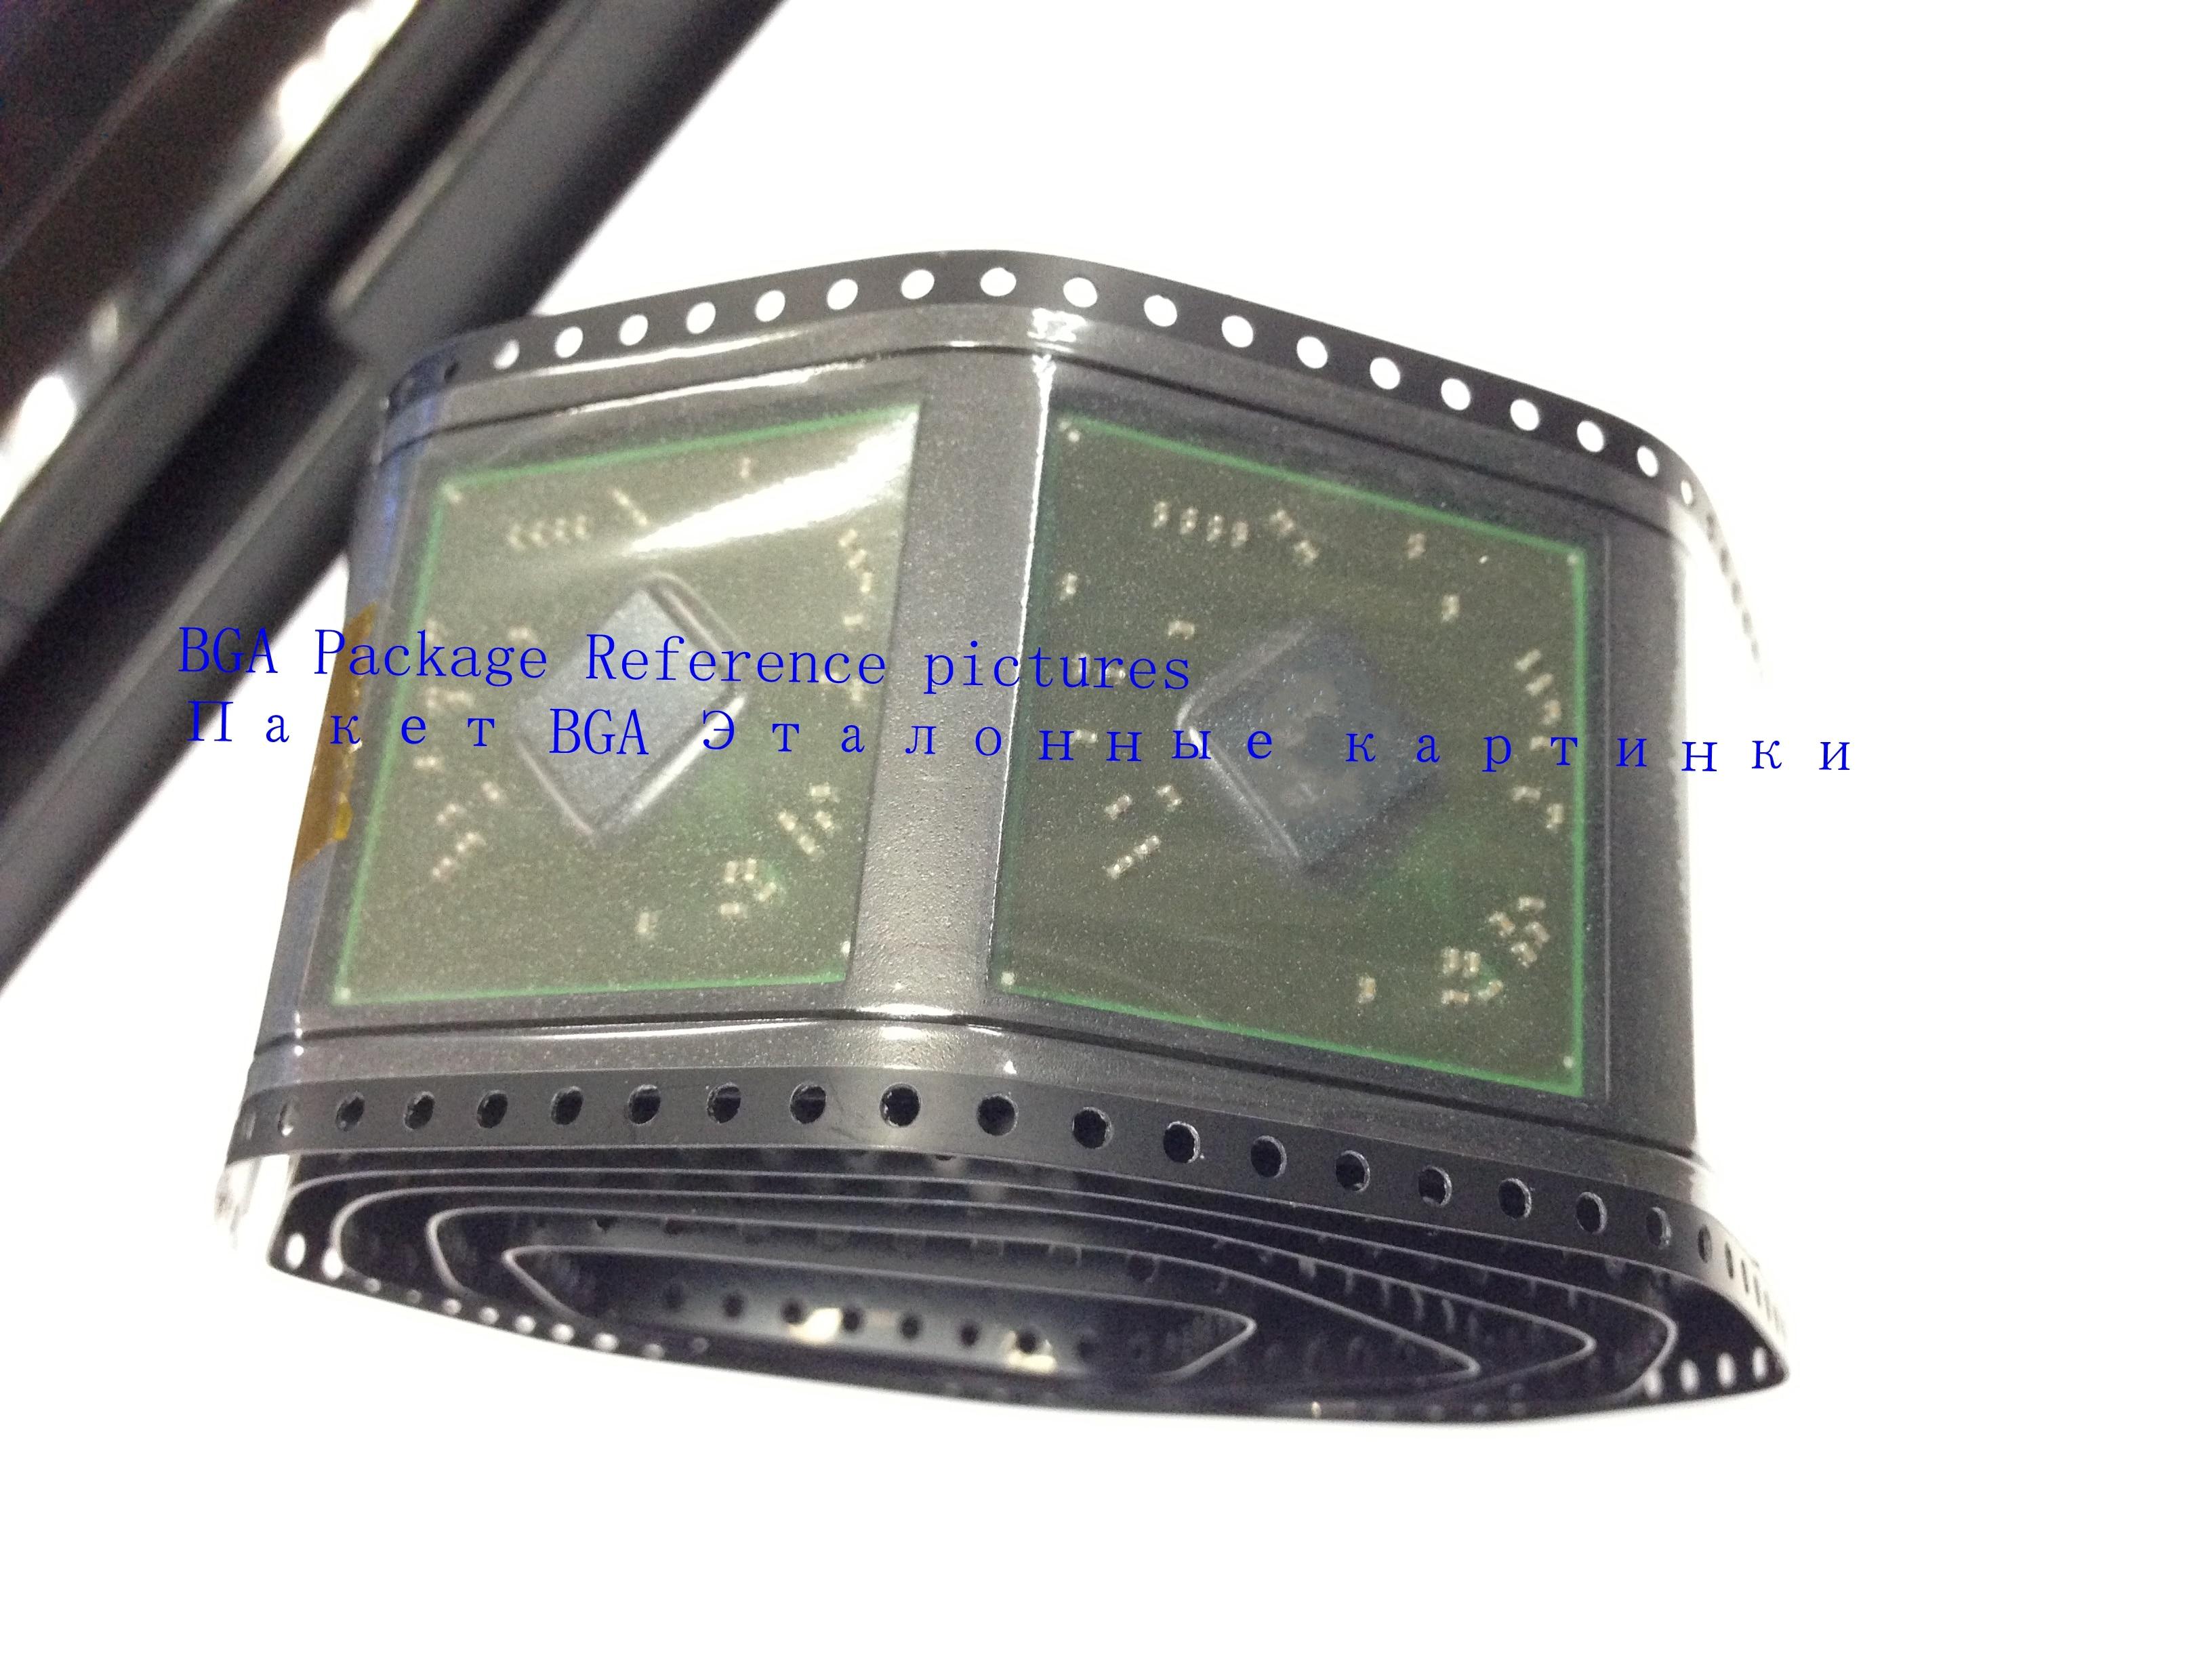 1pcs/lot 100% New GF-GO7400-B-N-A3 GF GO7400 B N A3 BGA Chipset1pcs/lot 100% New GF-GO7400-B-N-A3 GF GO7400 B N A3 BGA Chipset